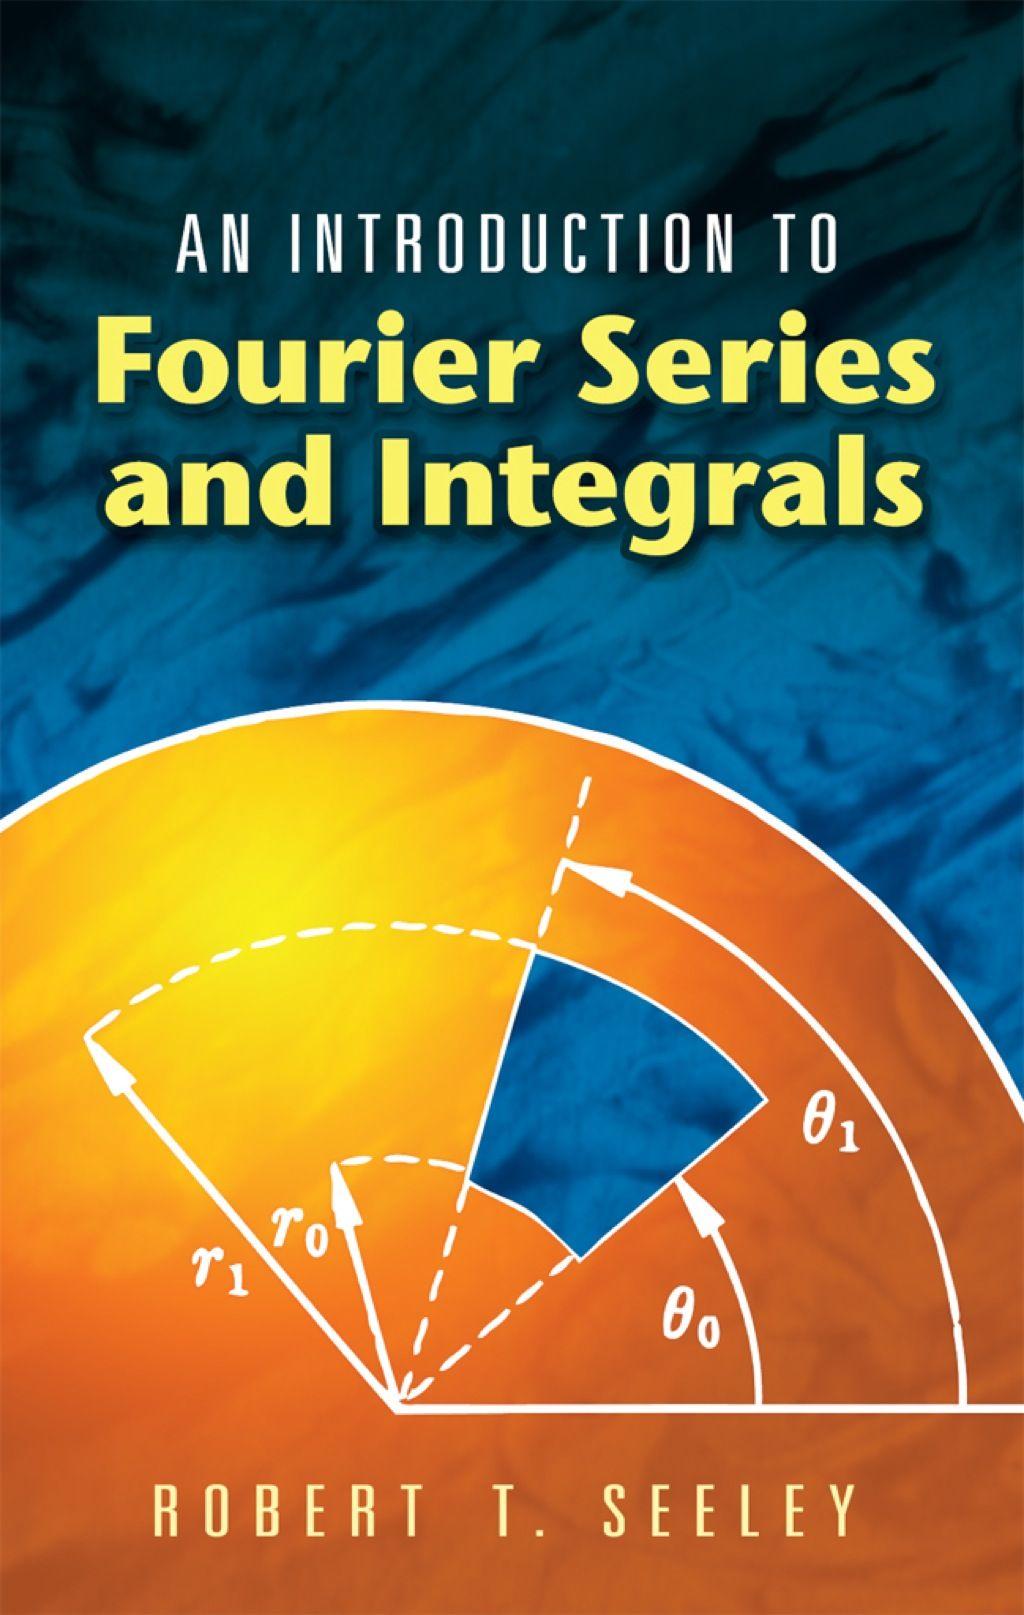 An Introduction To Fourier Series And Integrals Ebook Sciences Mathématiques Mathématiques Science